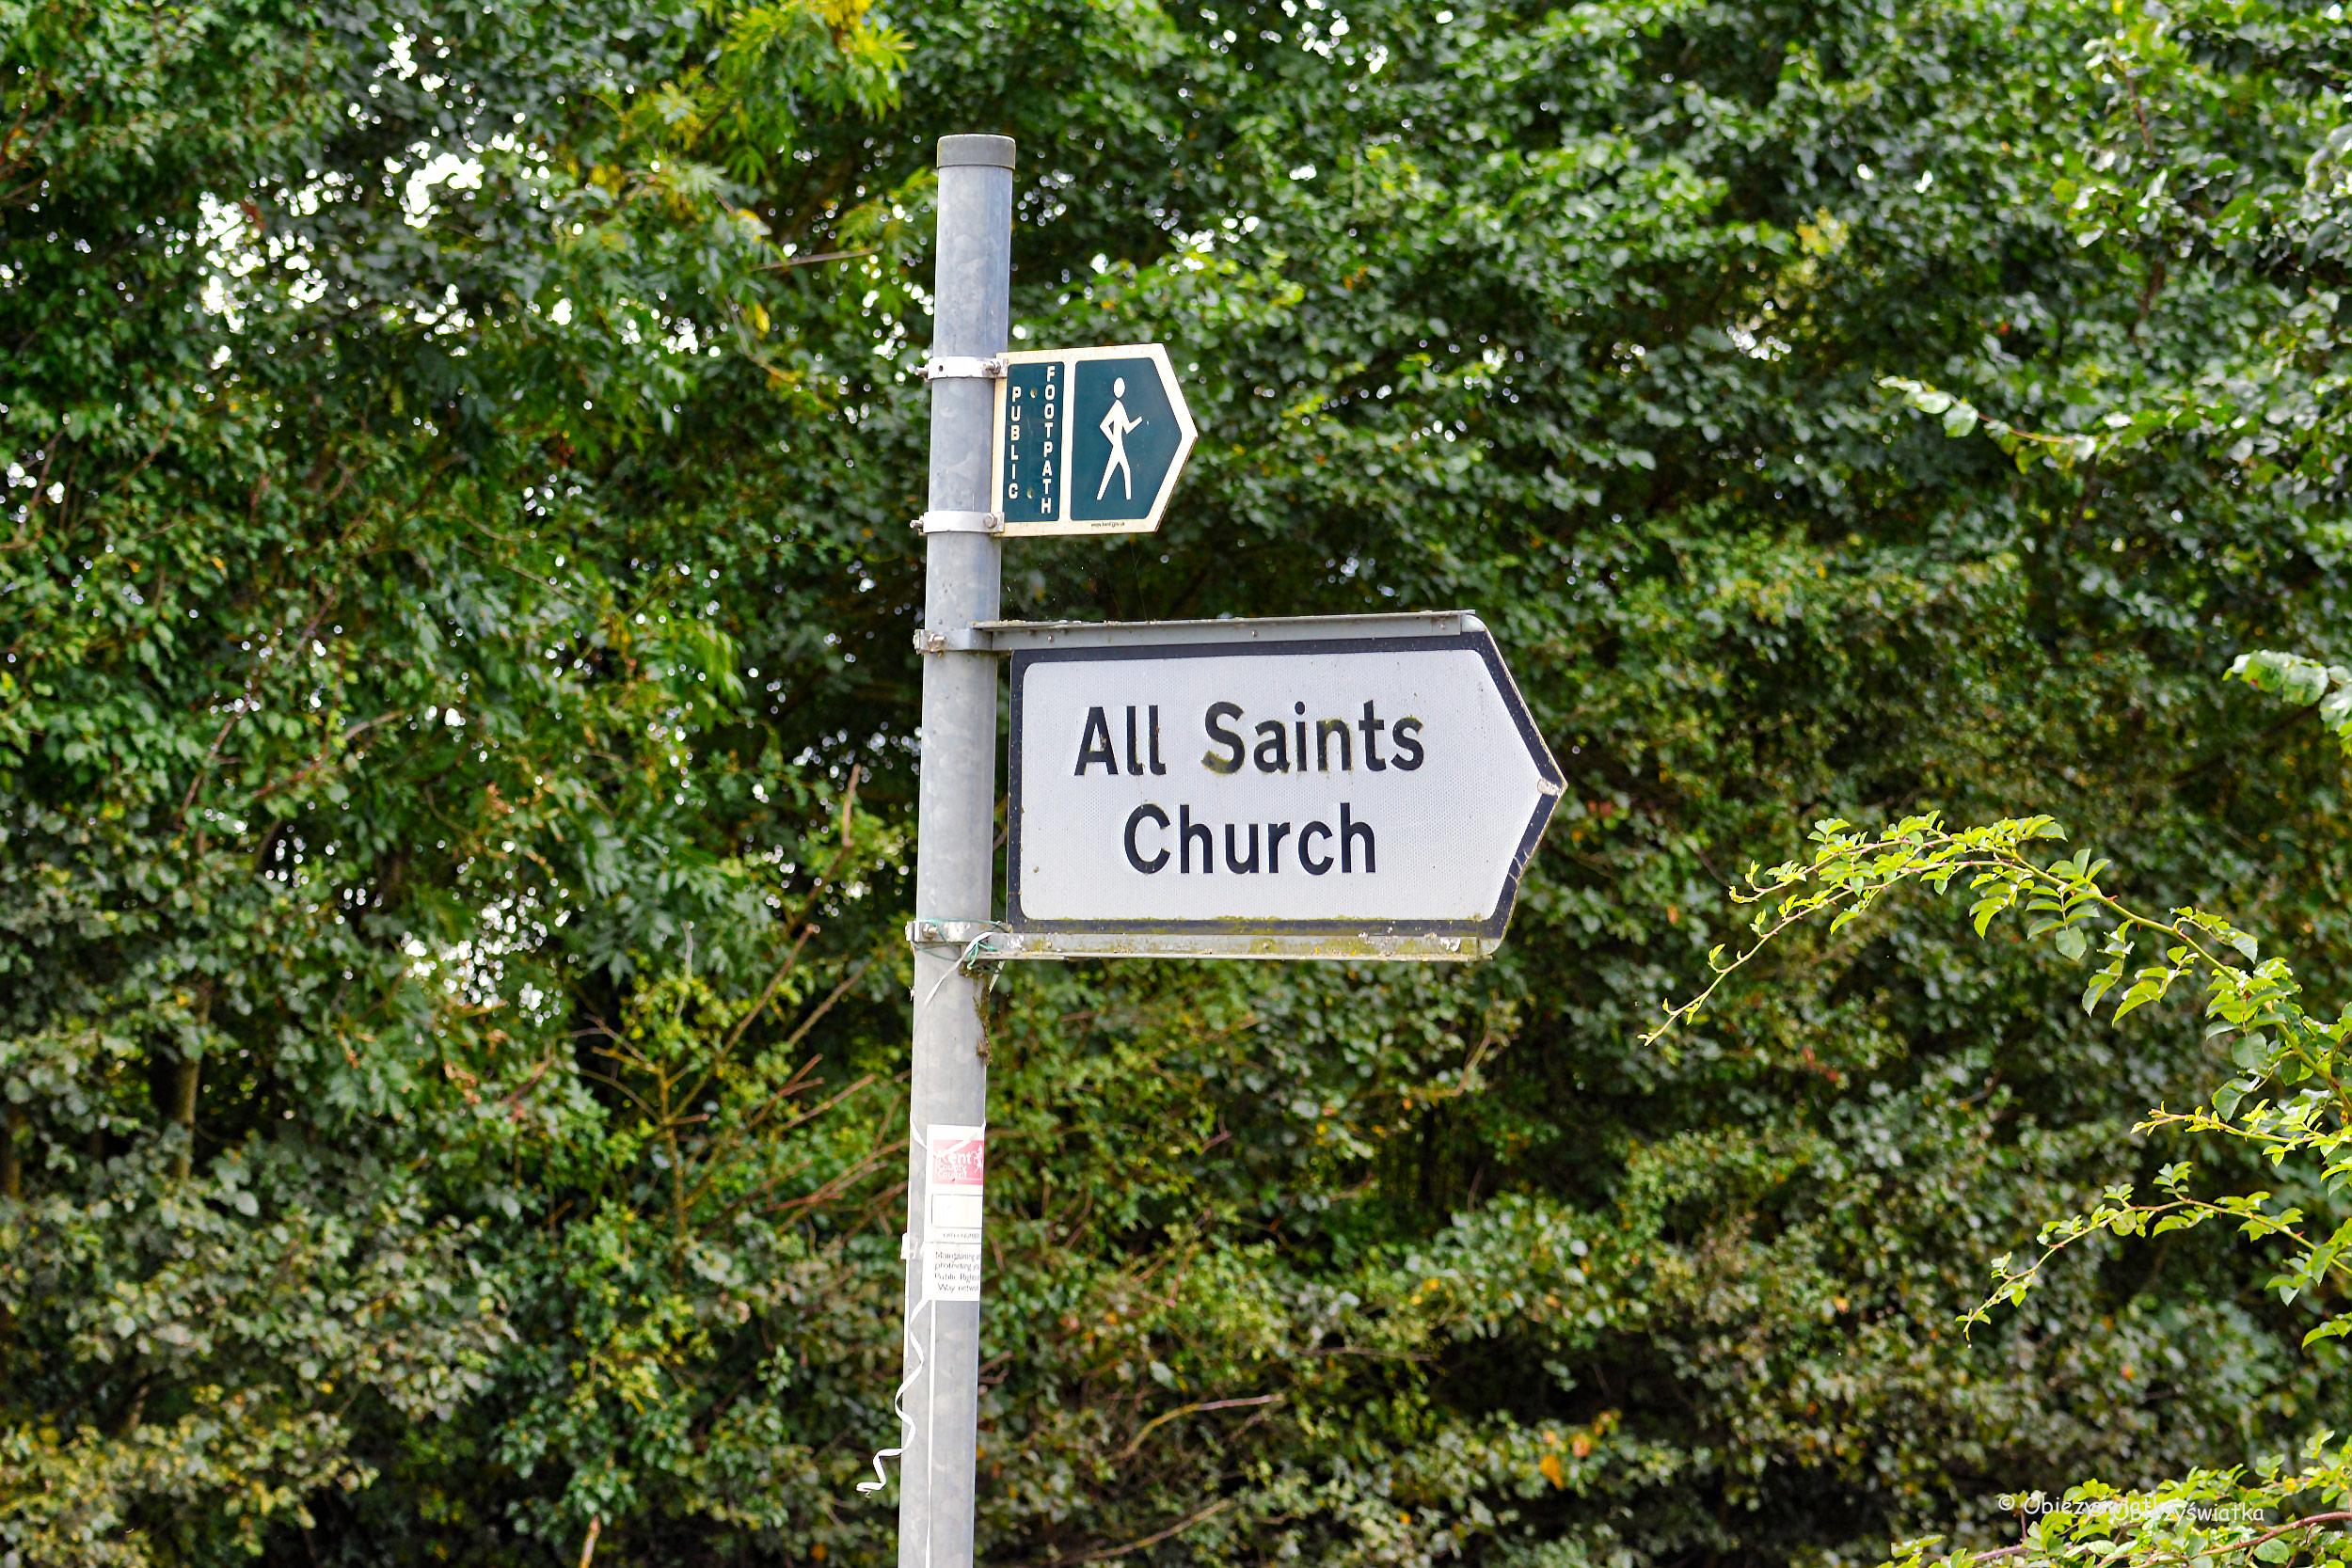 All Saints Church, Tudeley, UK